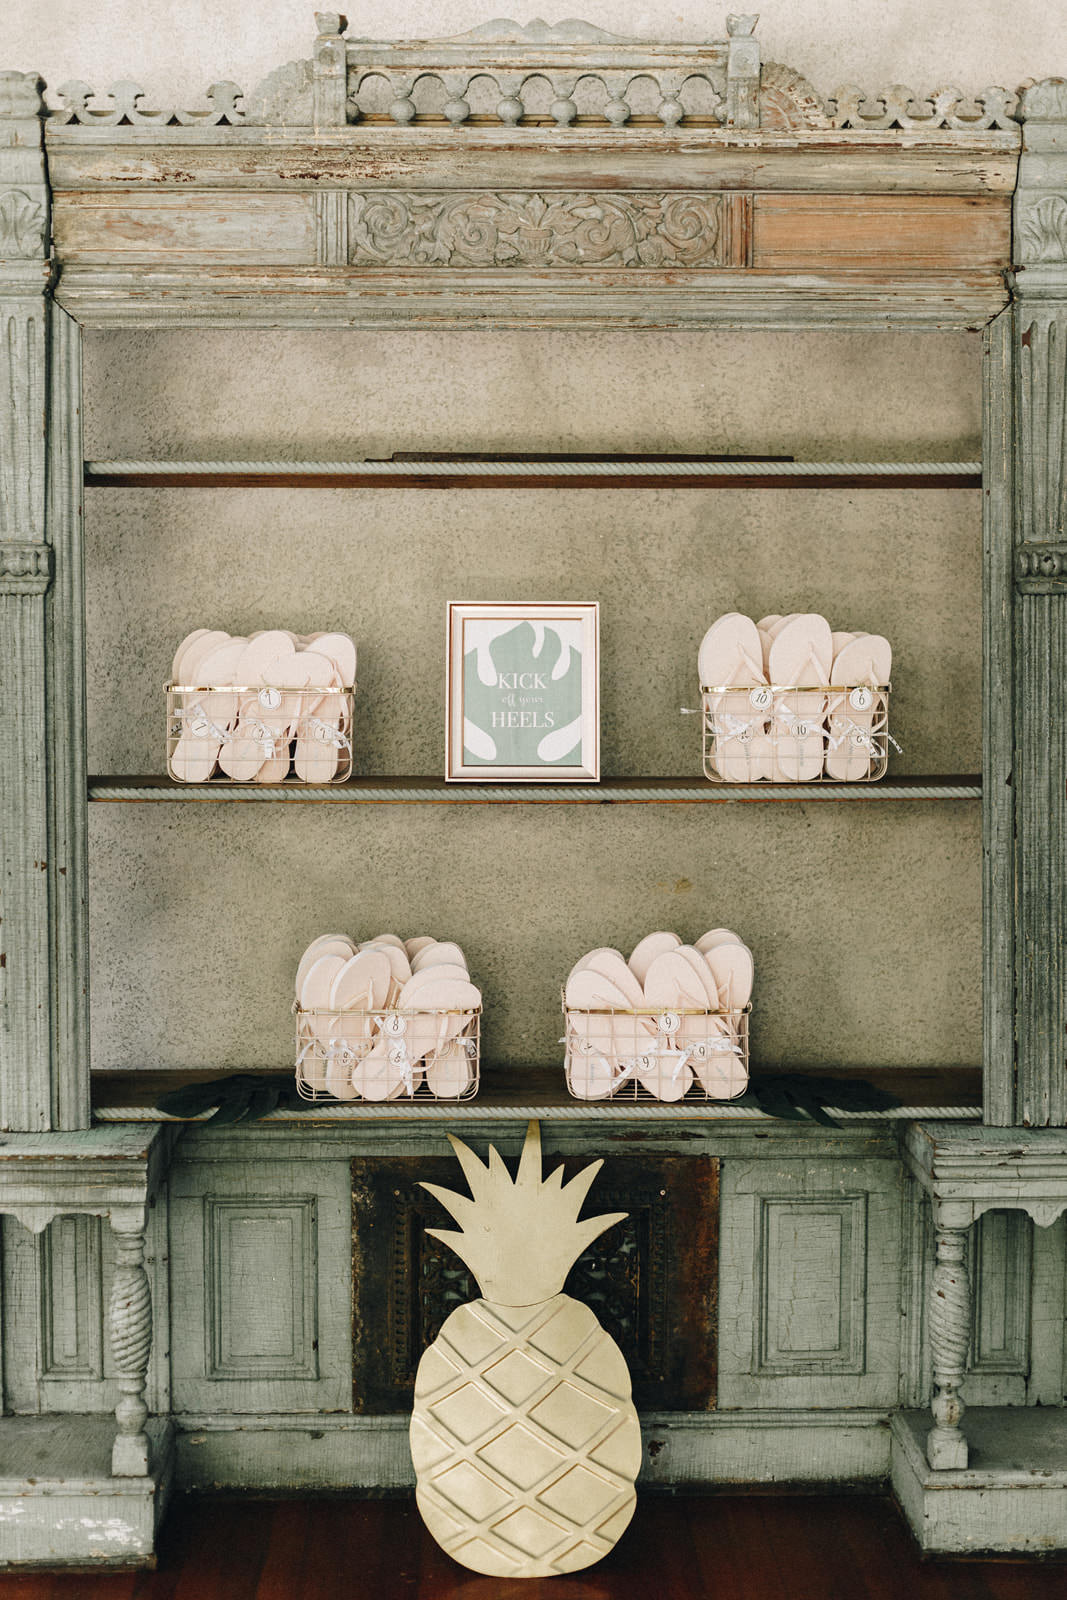 blush flip flops used as wedding favors.